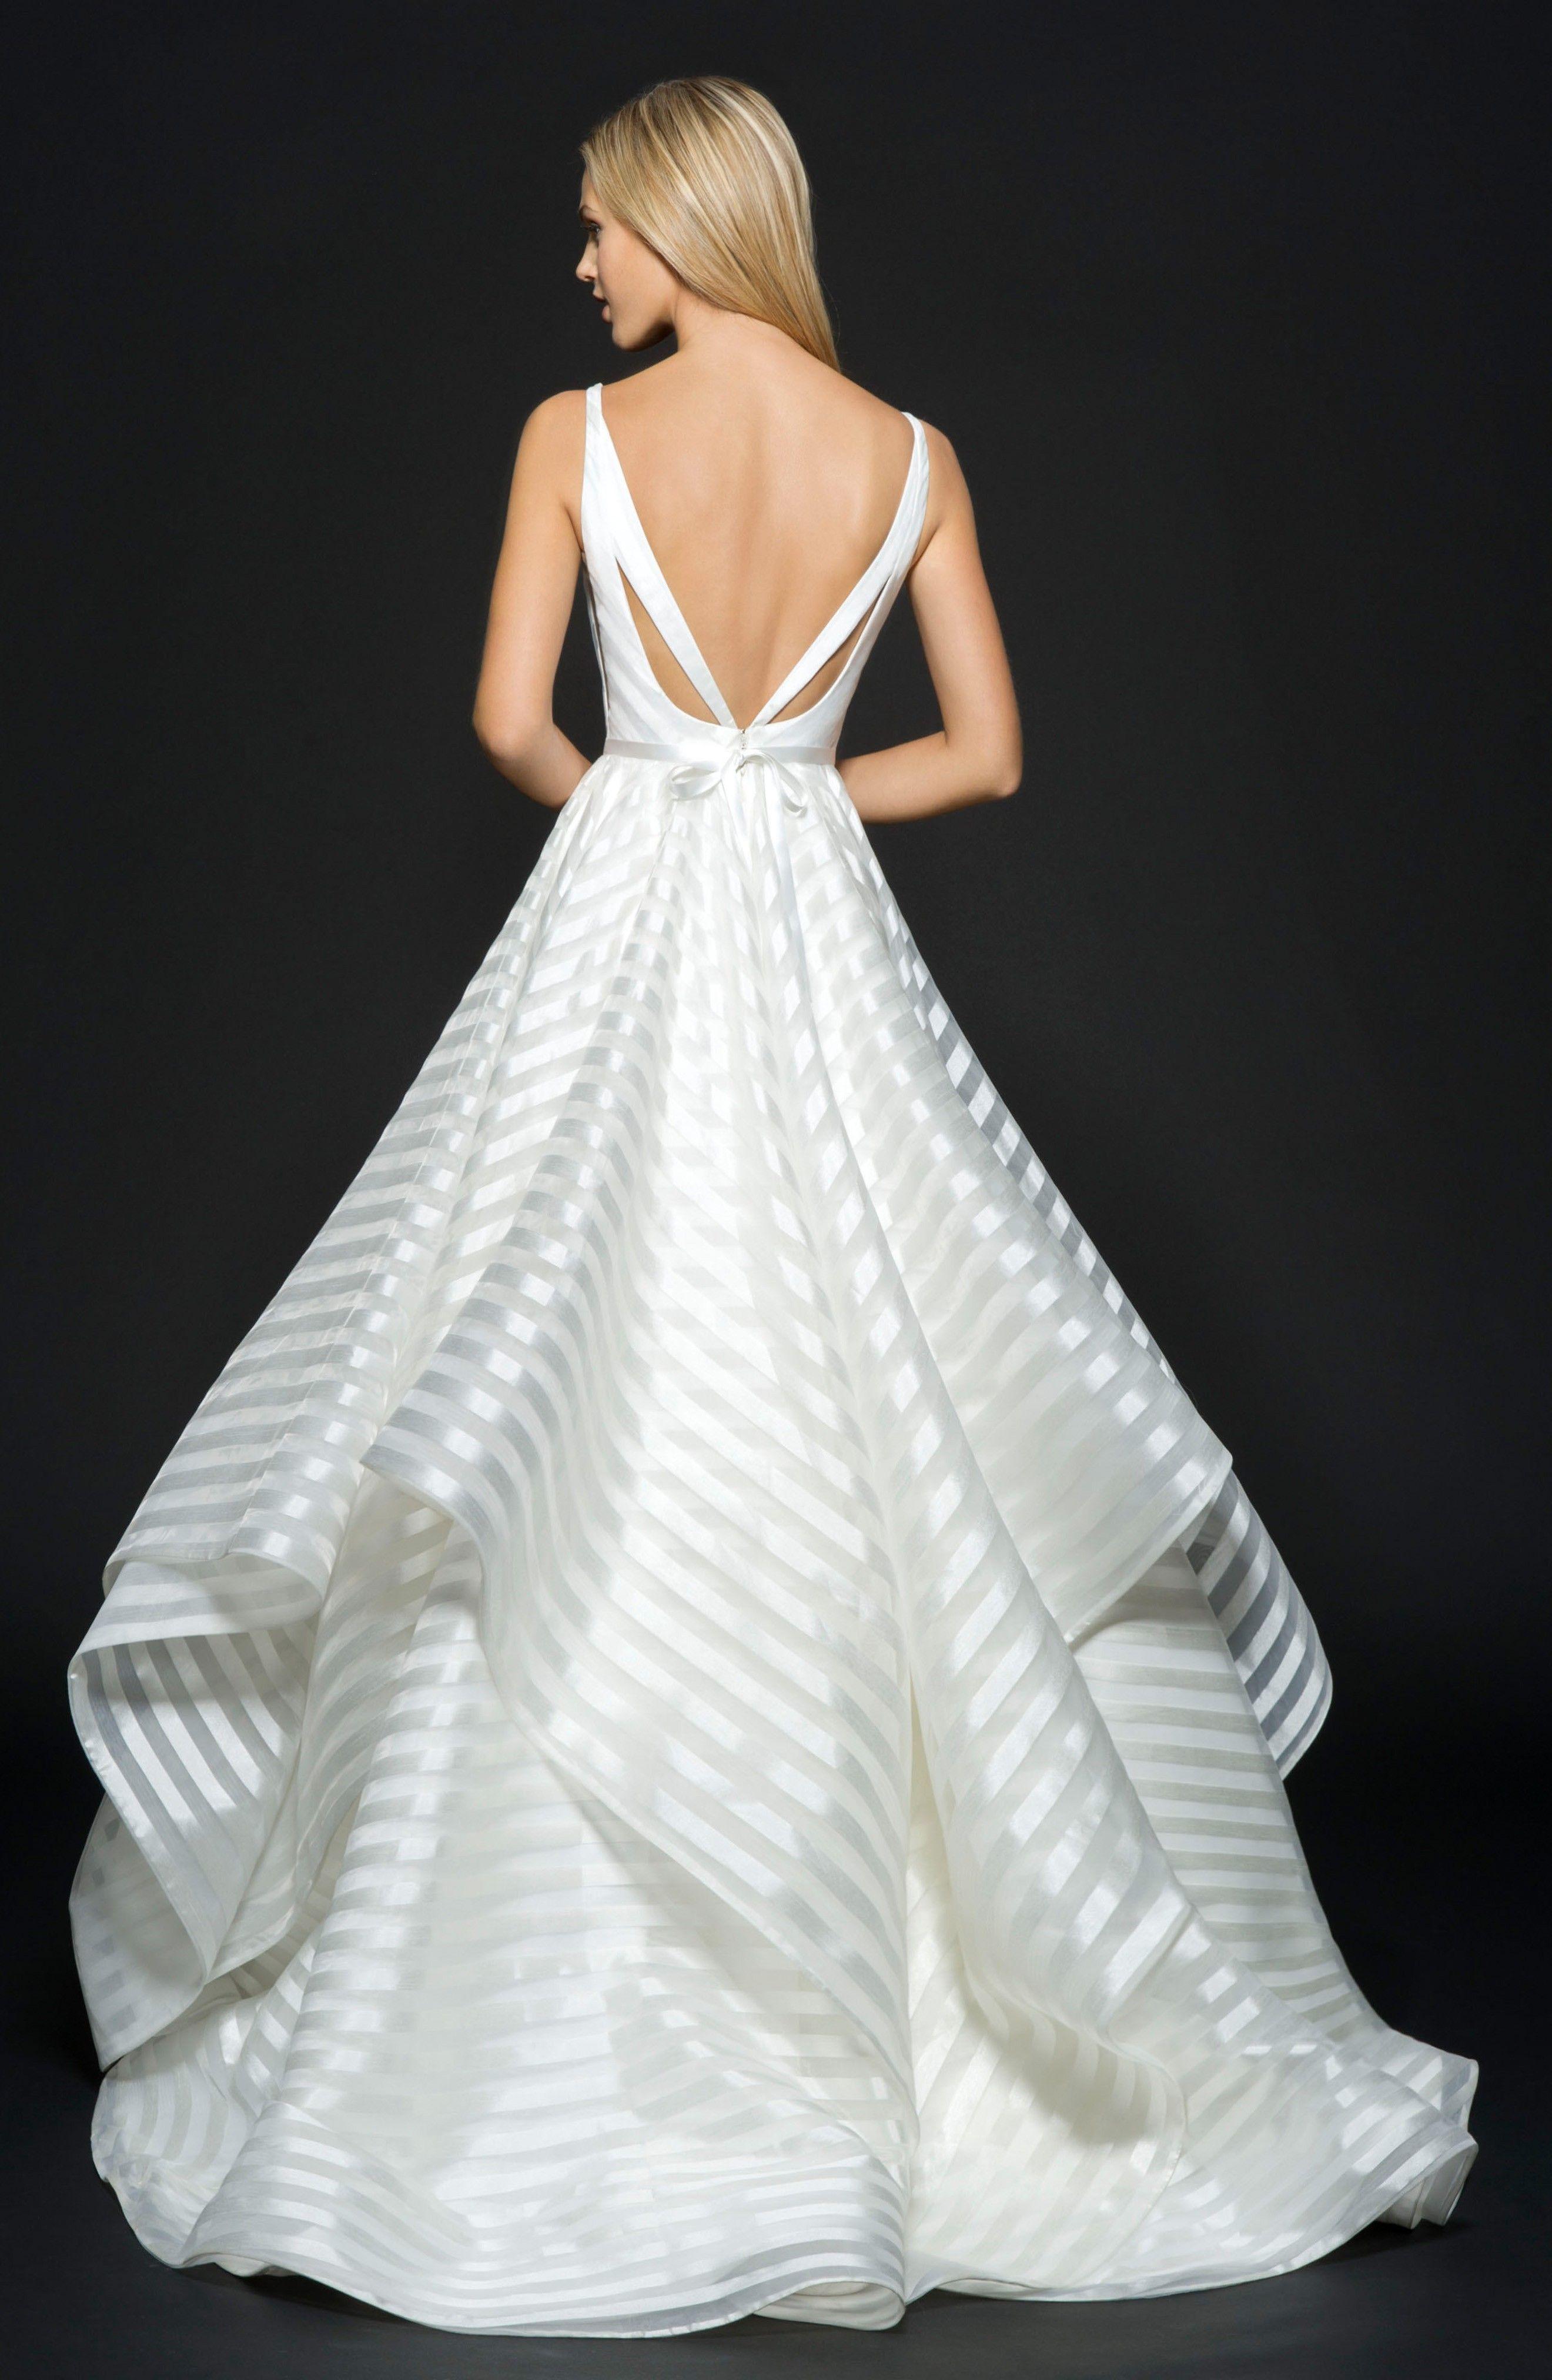 Nordstrom wedding dress  Decklyn Stripe Organza Ballgown by Hailey Paige at Nordstrom ad